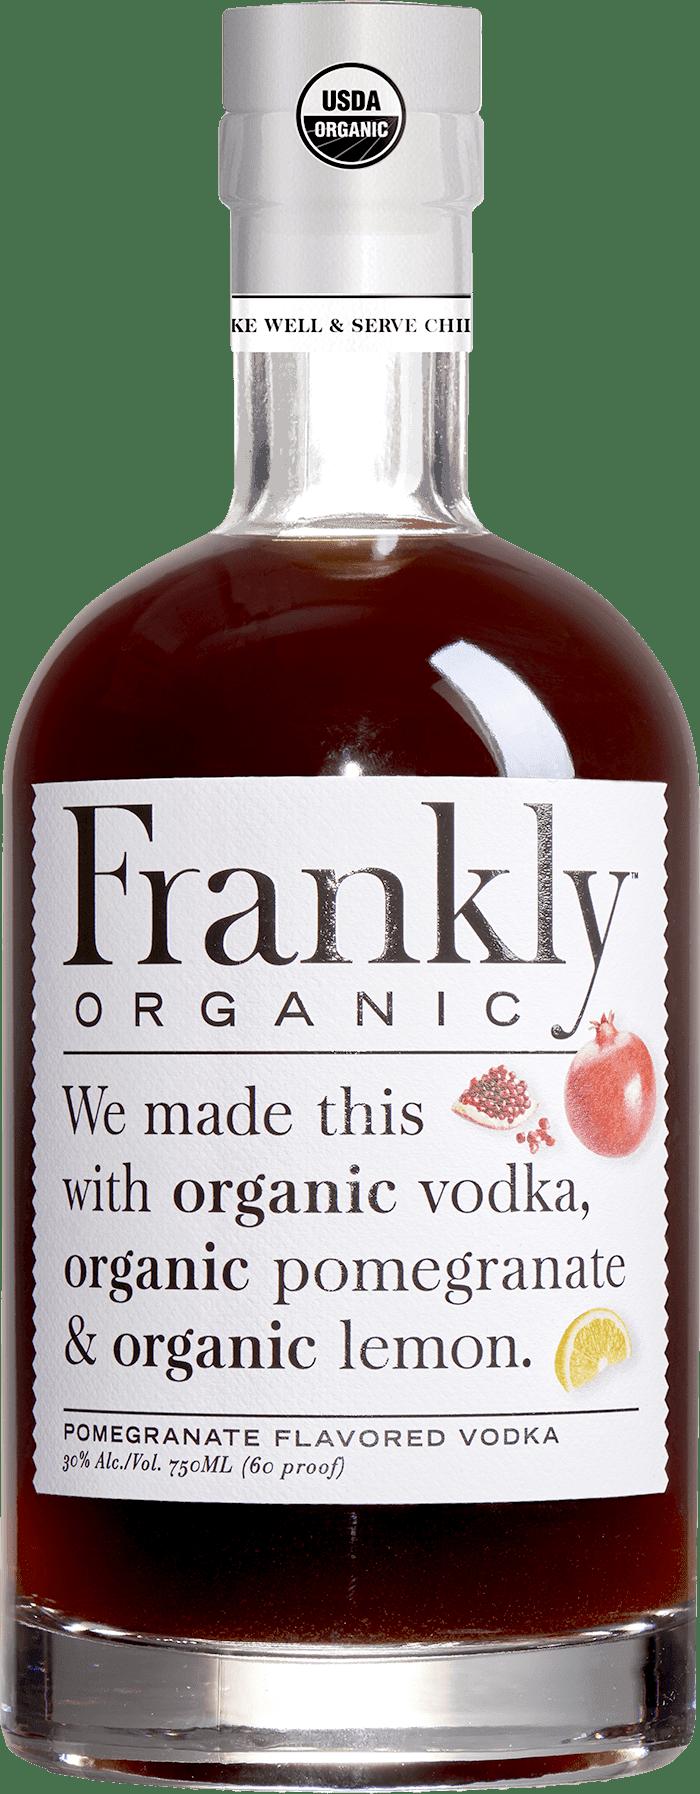 Bottle of pomegranate vodka.